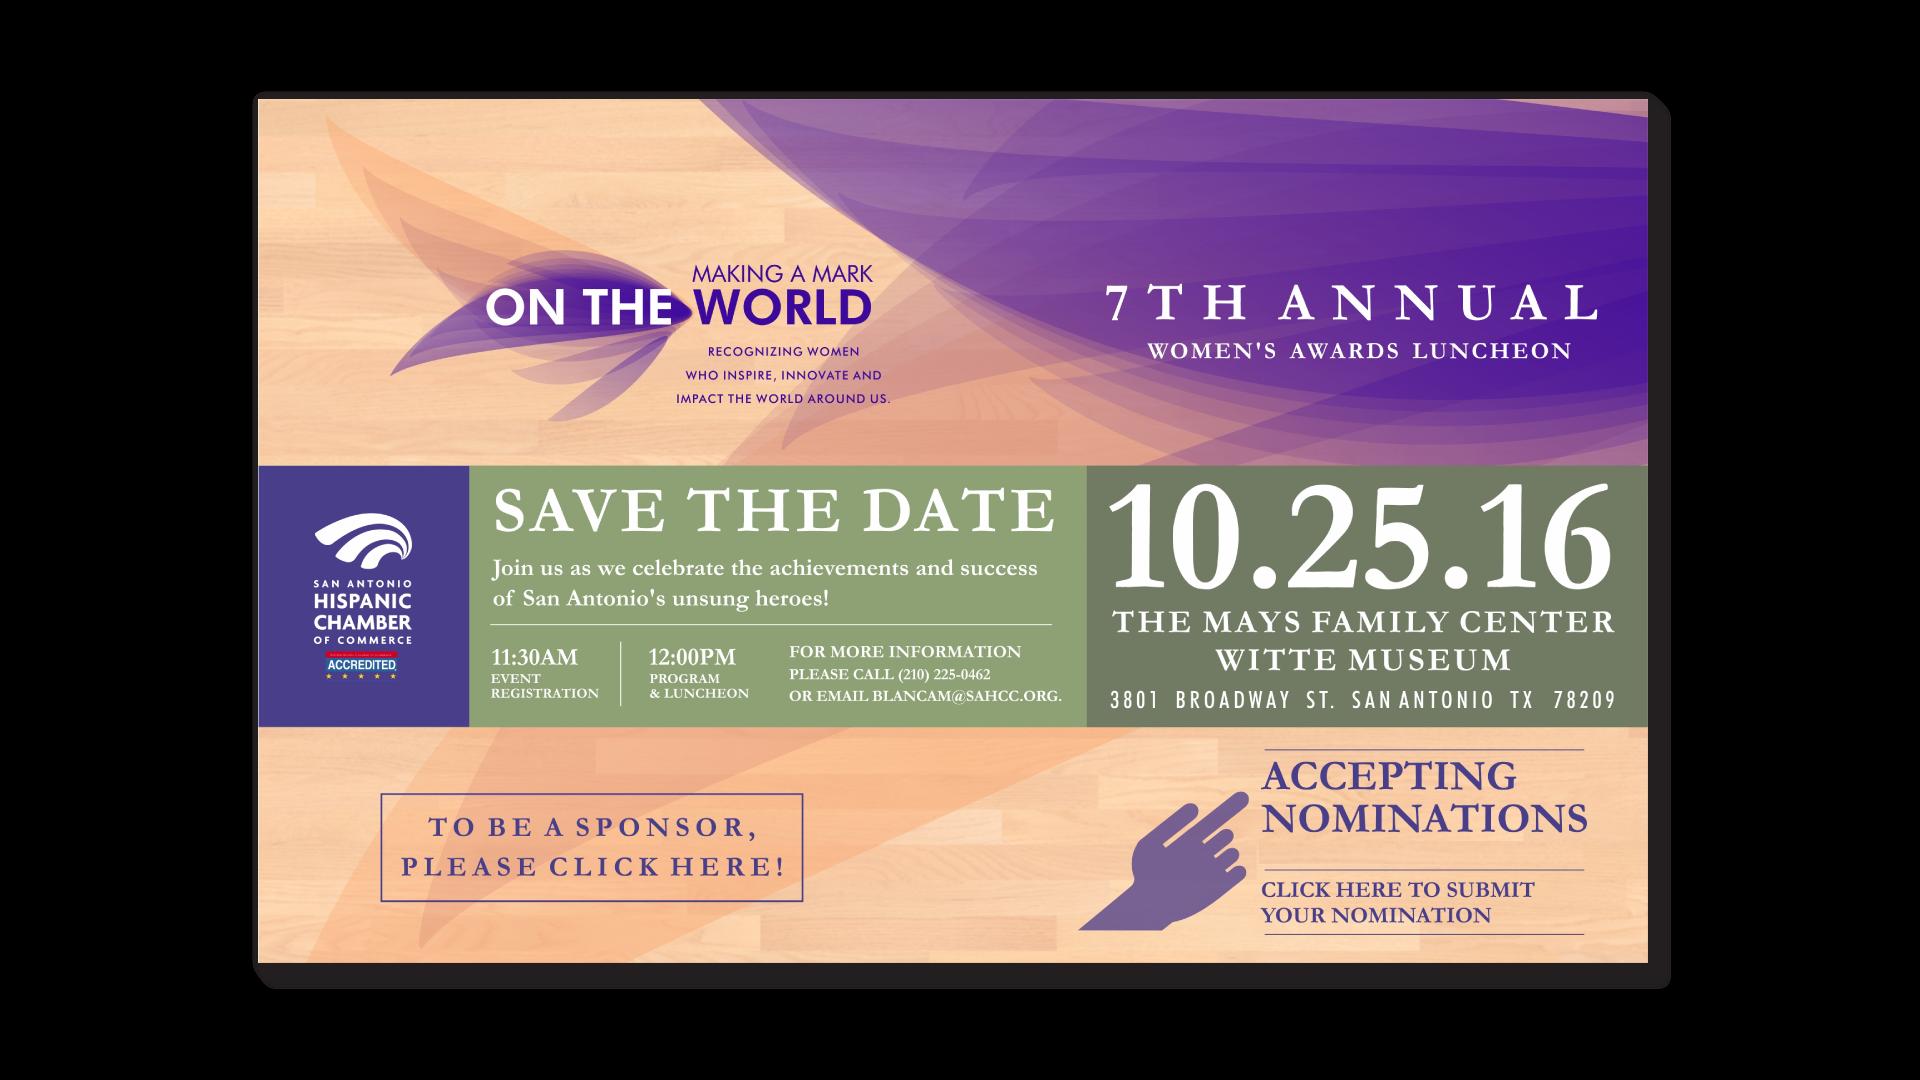 San Antonio Hispanic Chamber of Commerce 7th Annual Women's Awards Luncheon